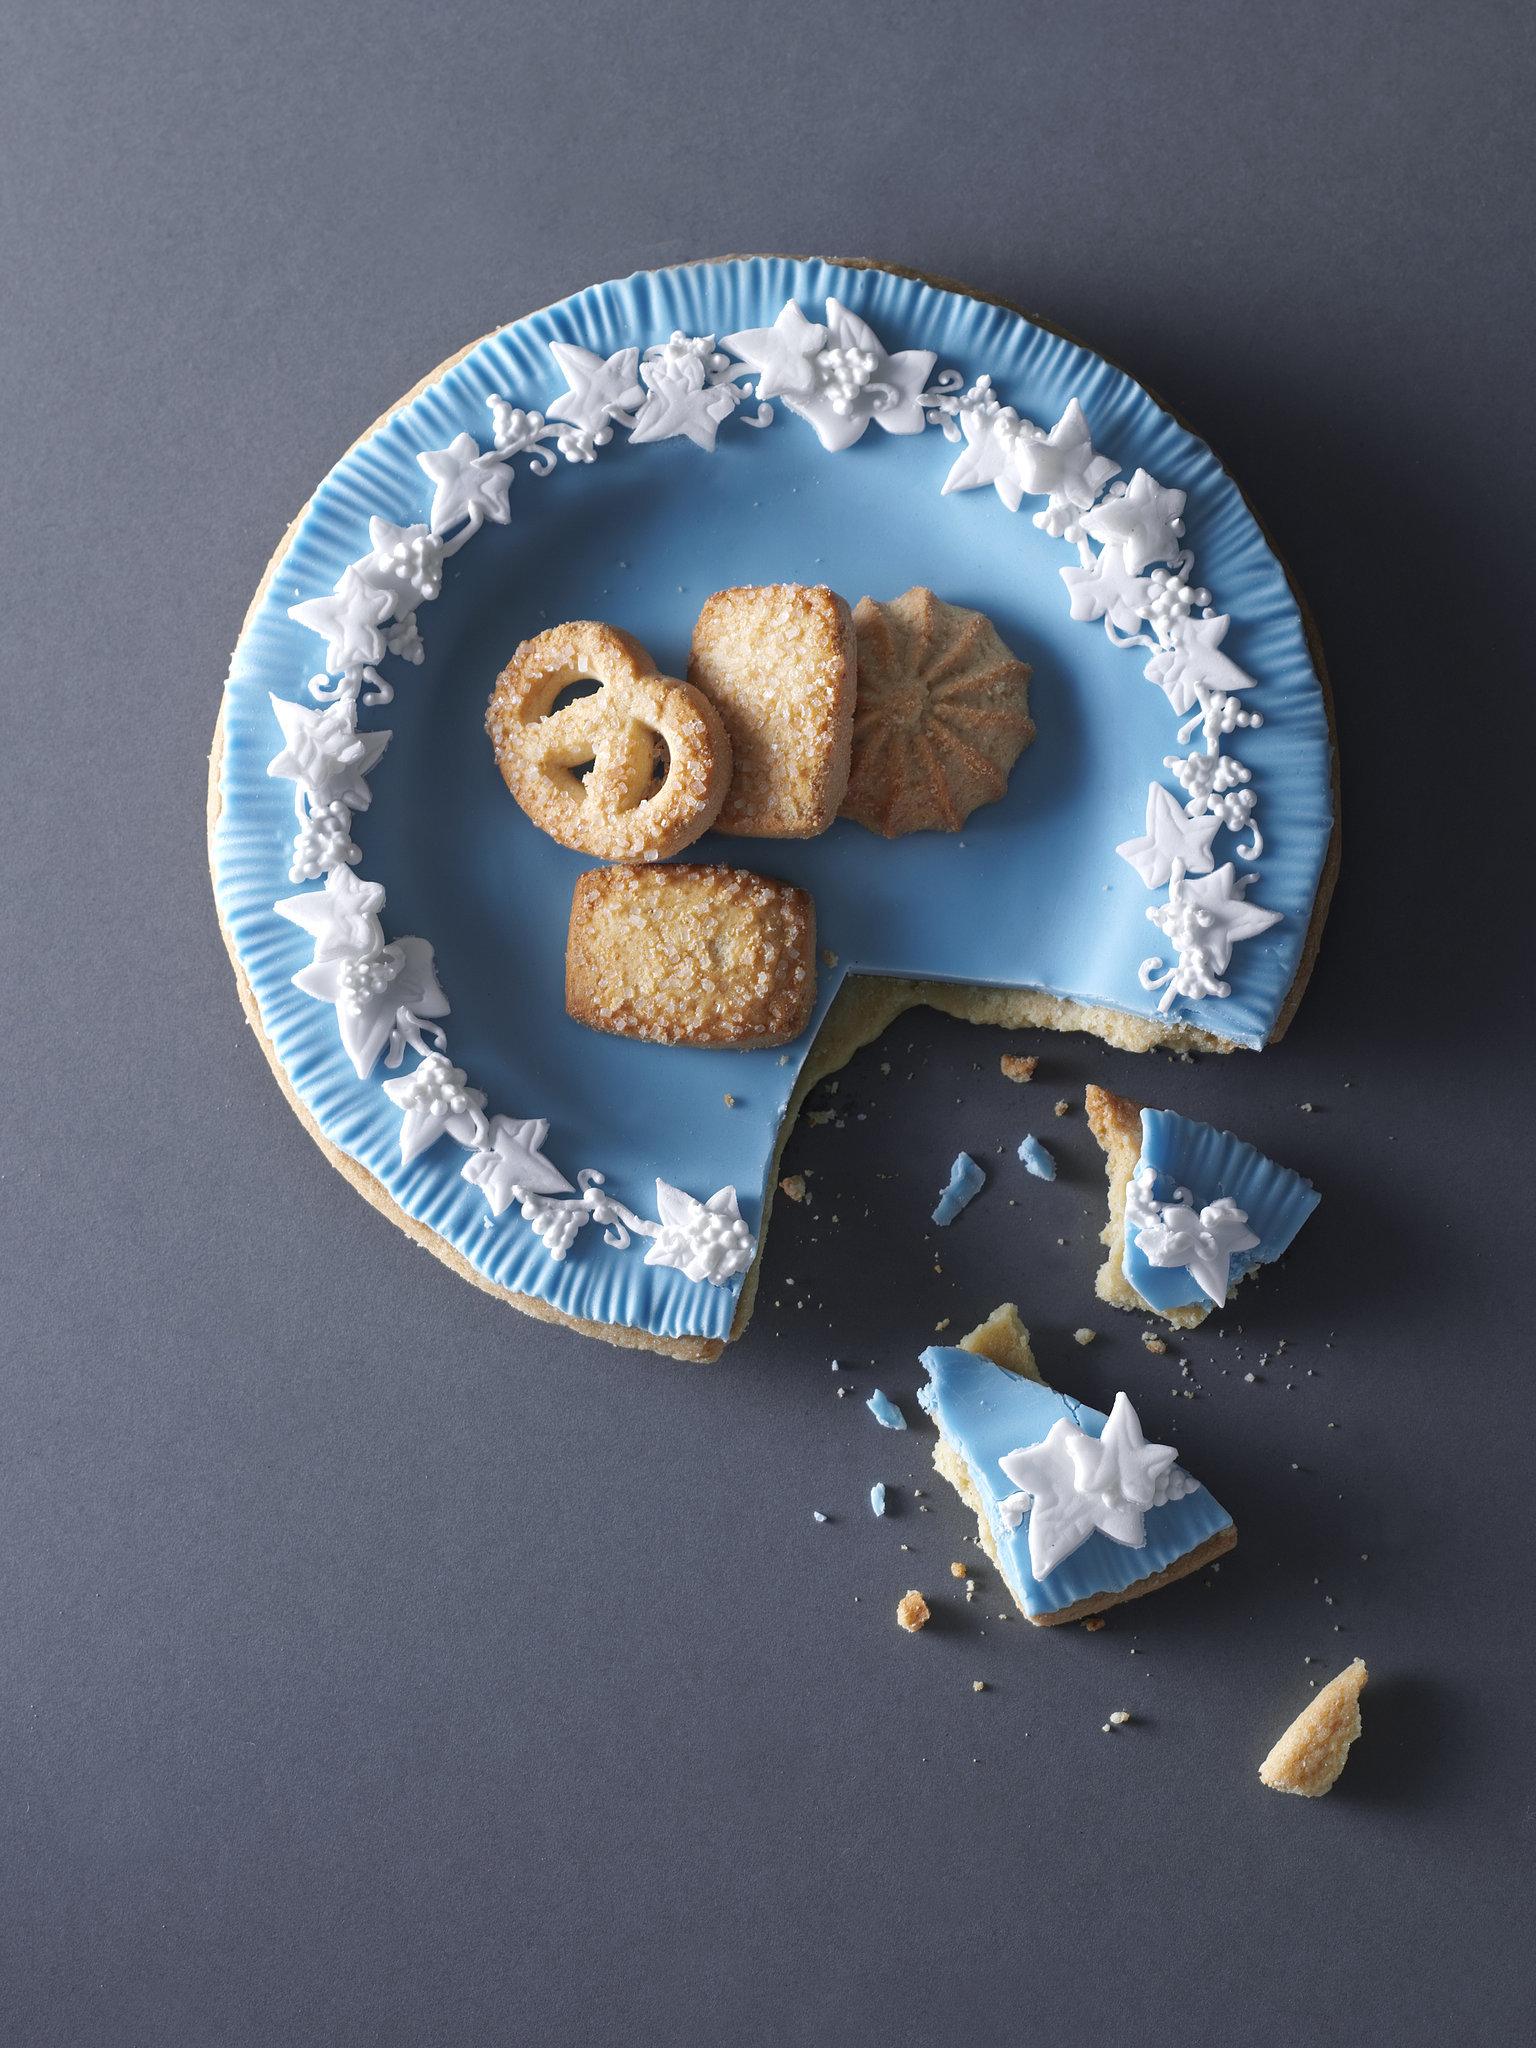 Wedgwood-Inspired Shortbread